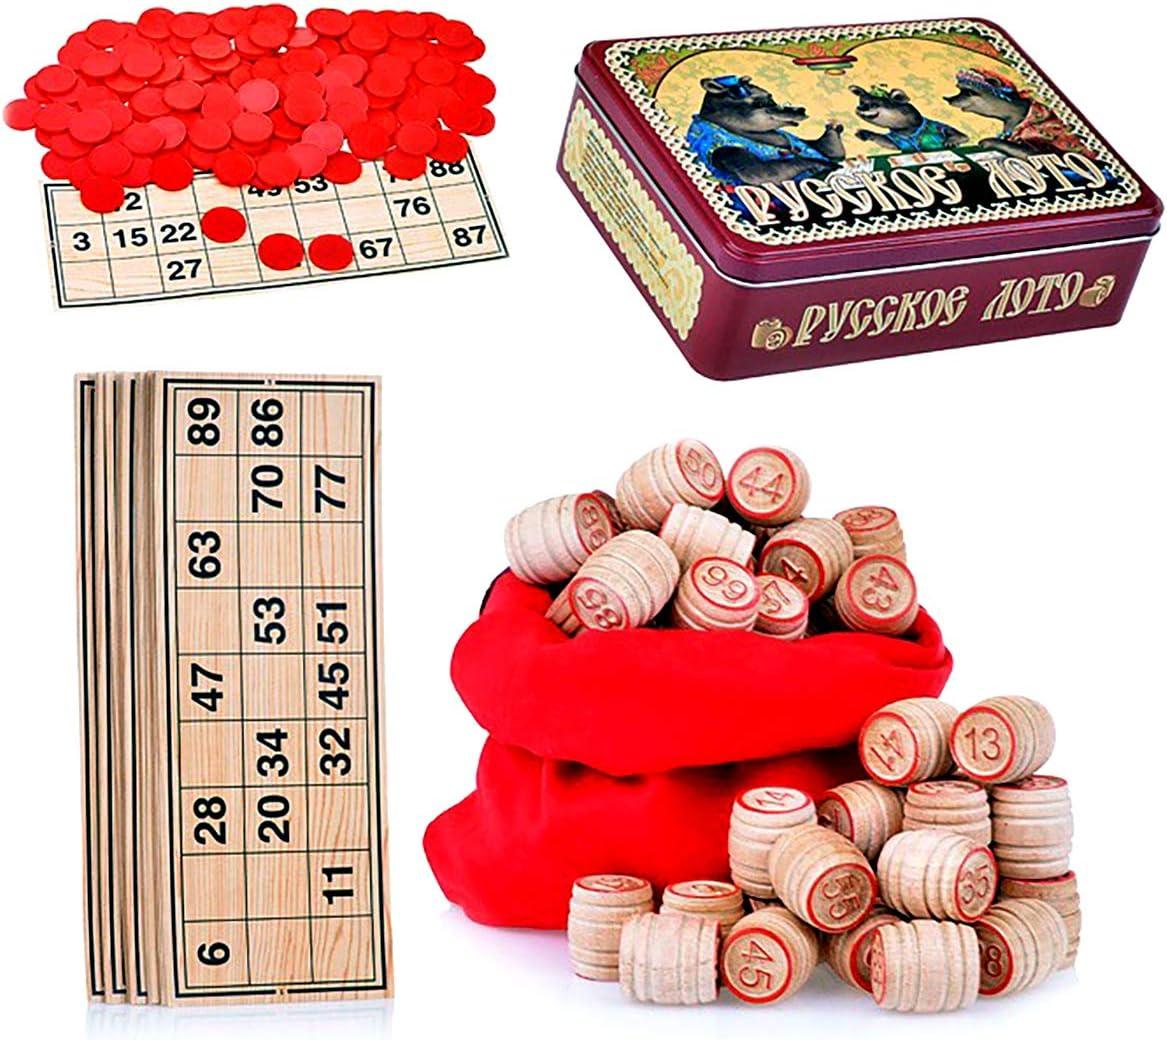 Russian Lotto Board Game Set Three Bears - Tambola Bingo Game Set in Tin Box Metal Case - Rysskoe Loto Loteria Cards